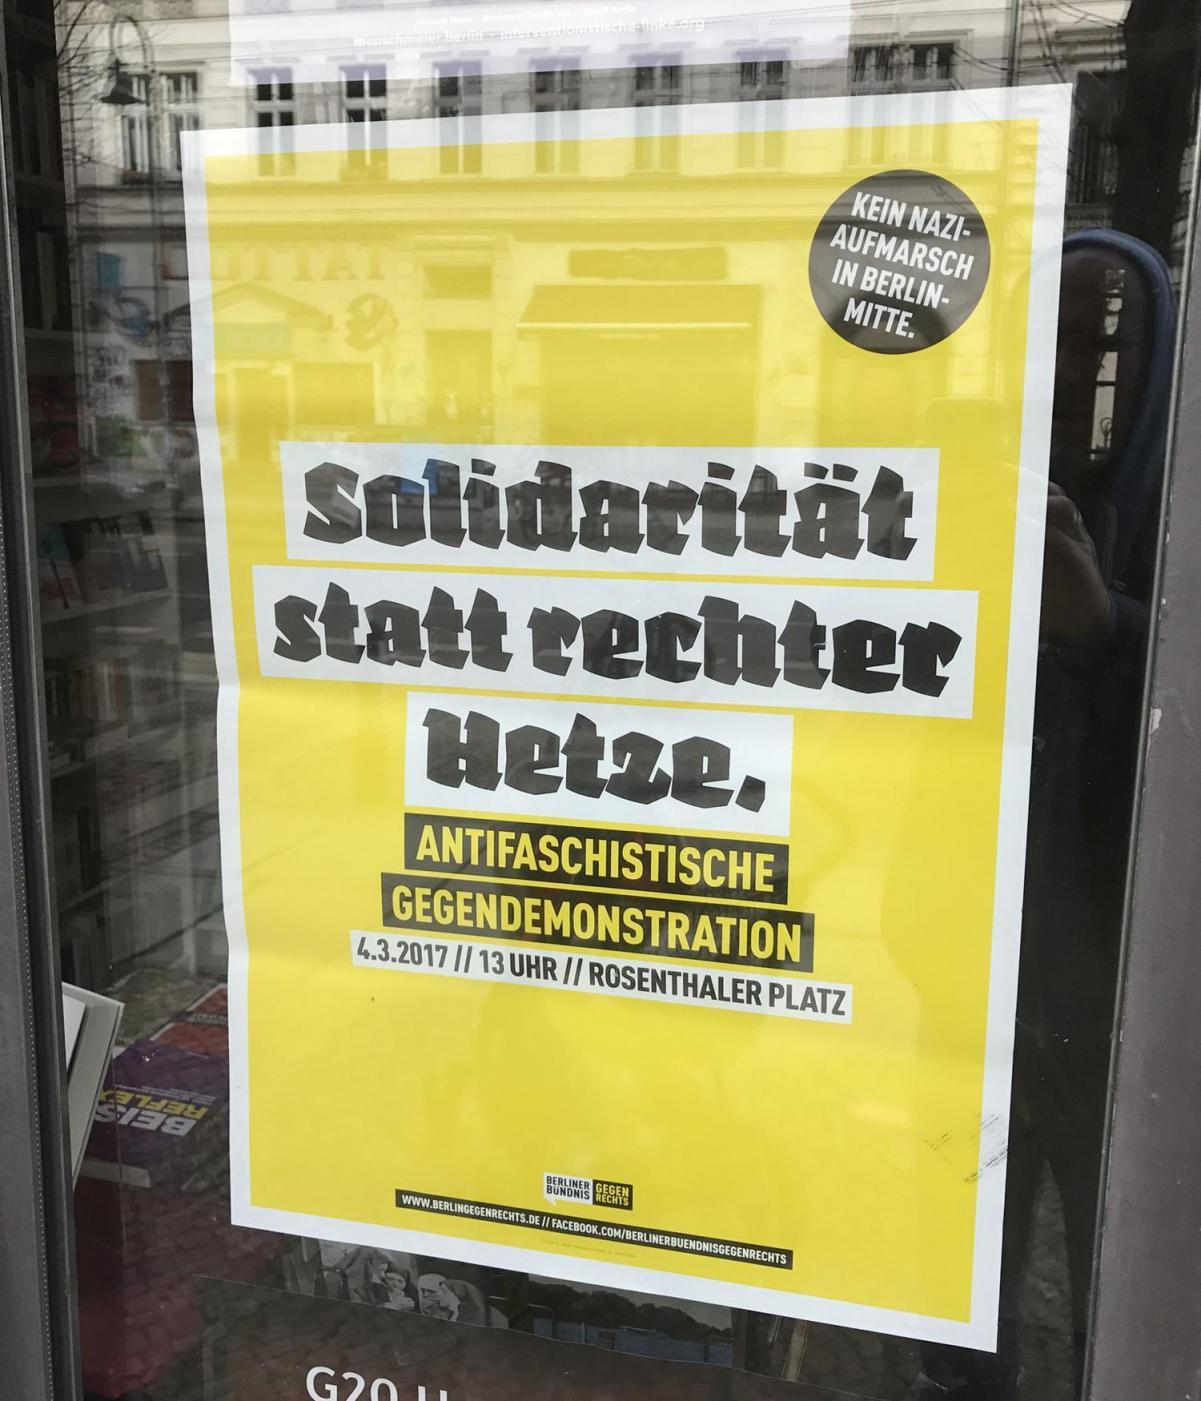 Solidaritaet.thumb.JPG.50d59e0916e50121d9309a23e0bd6e2c.JPG